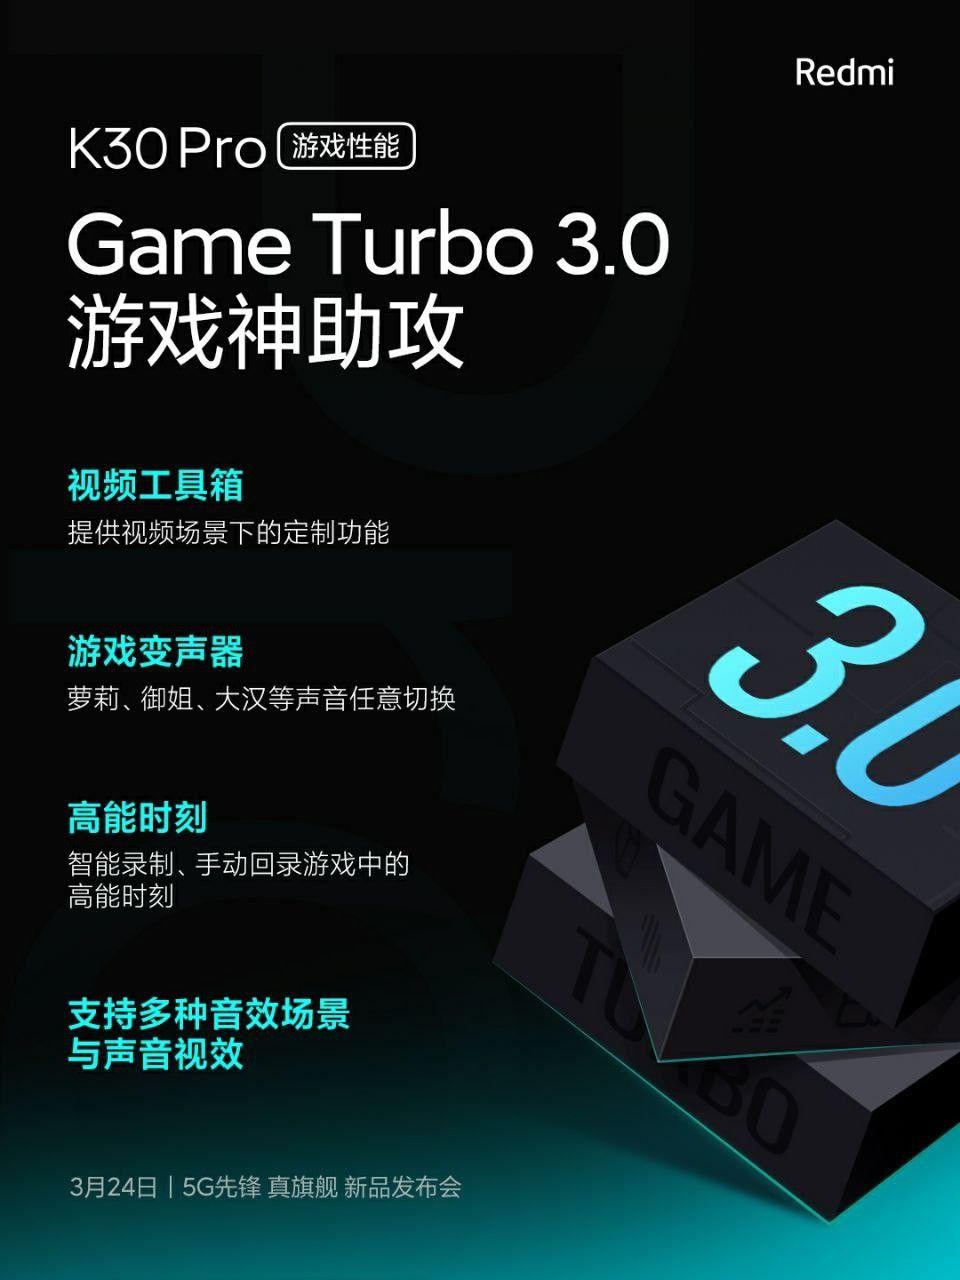 Redmi K30 Pro With Game Turbo 3 0 Turbo Games Power Button